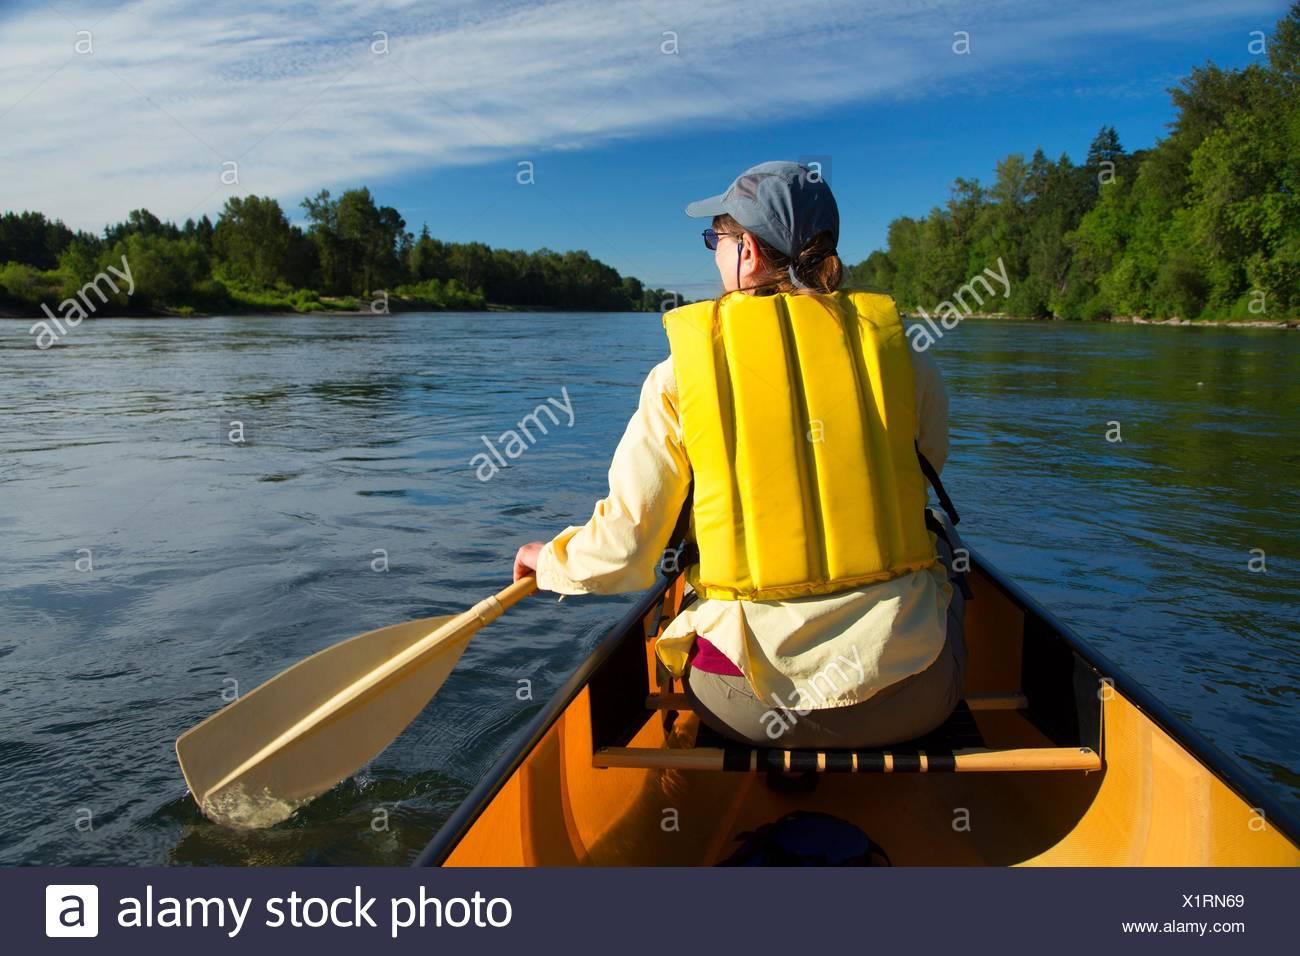 Canotage sur la rivière Willamette, Willamette River Greenway, Polk County, Oregon. Photo Stock